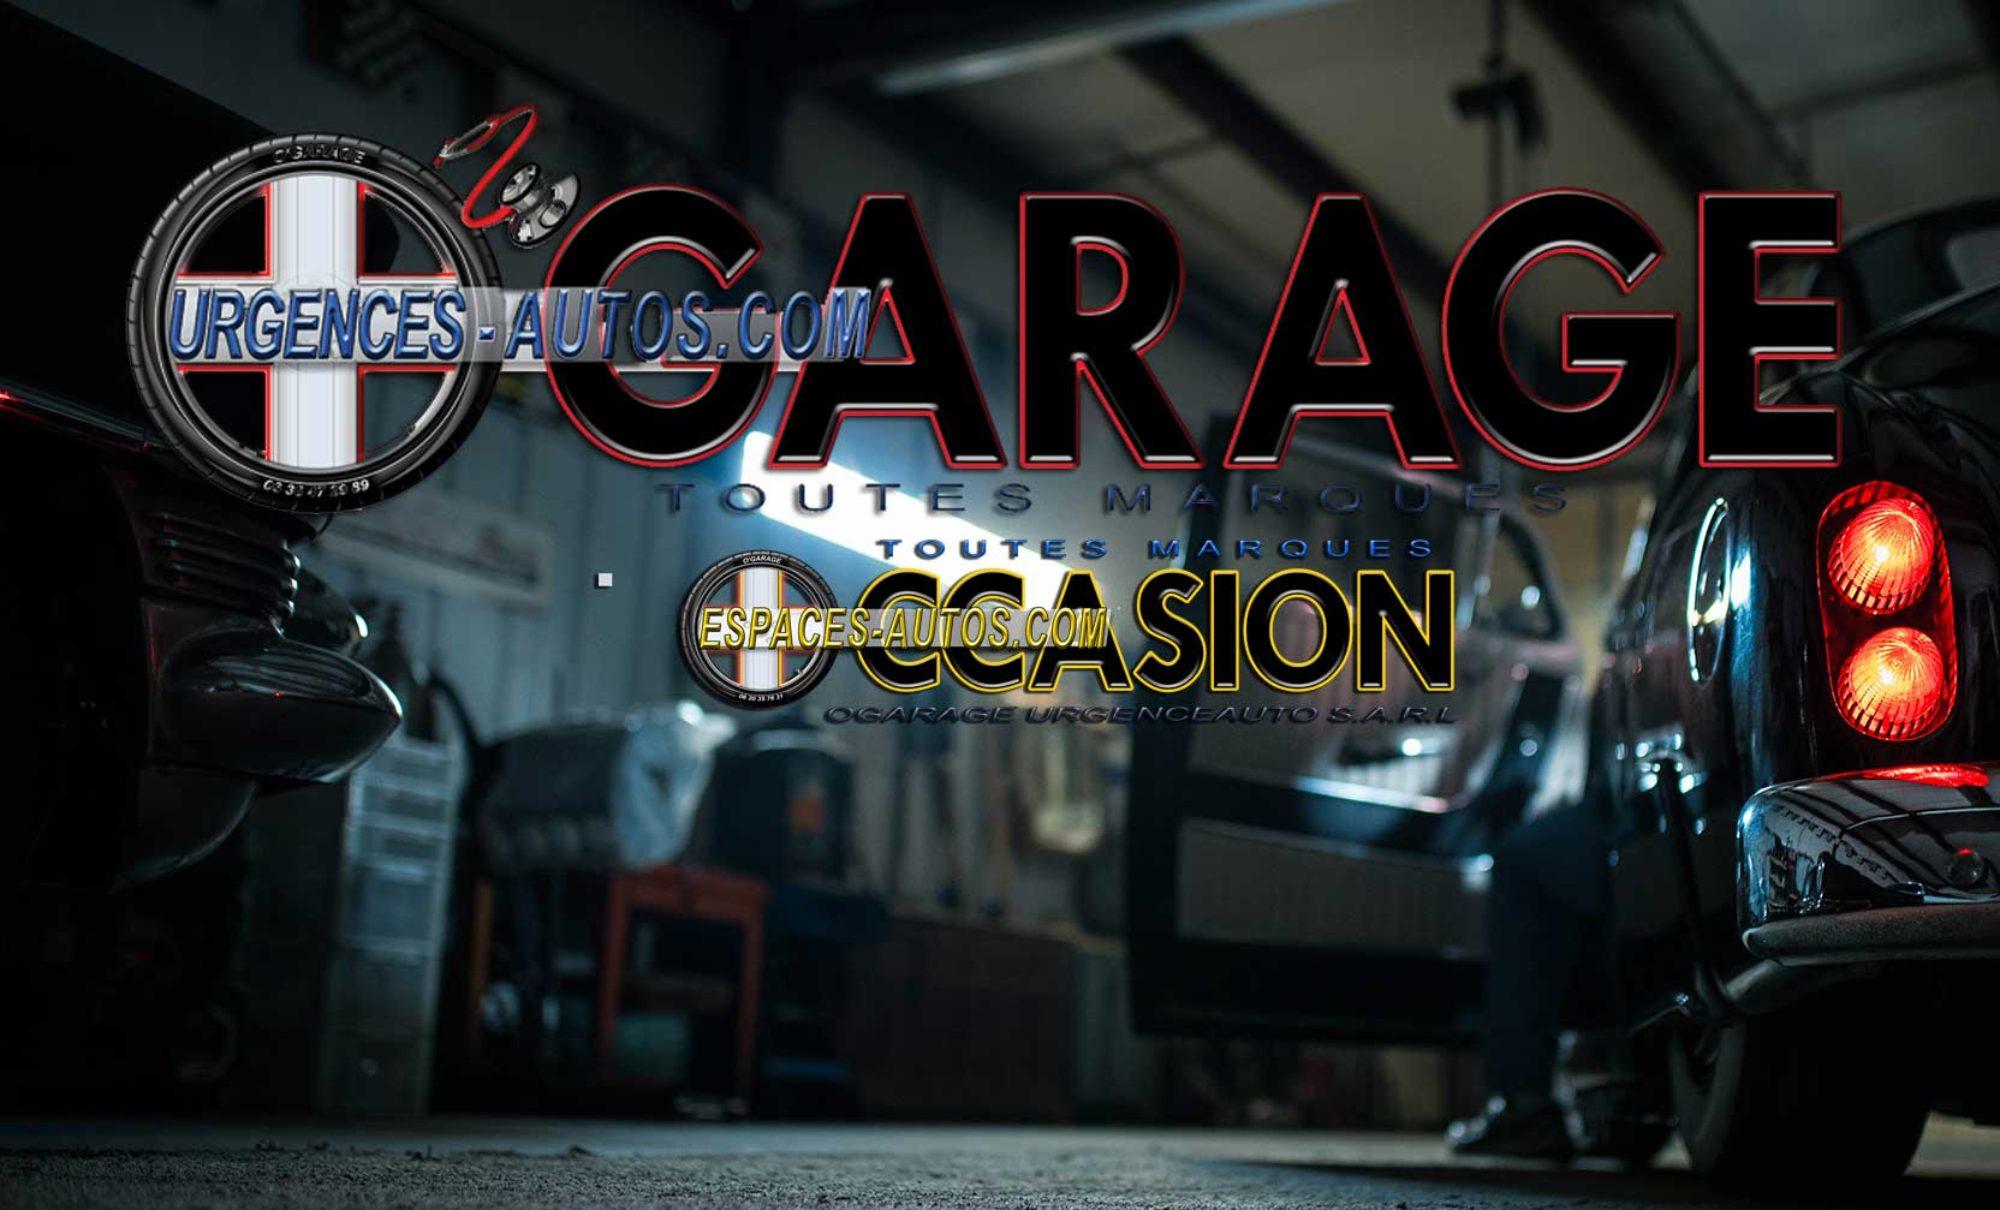 O'Garage - URGENCEAUTOS